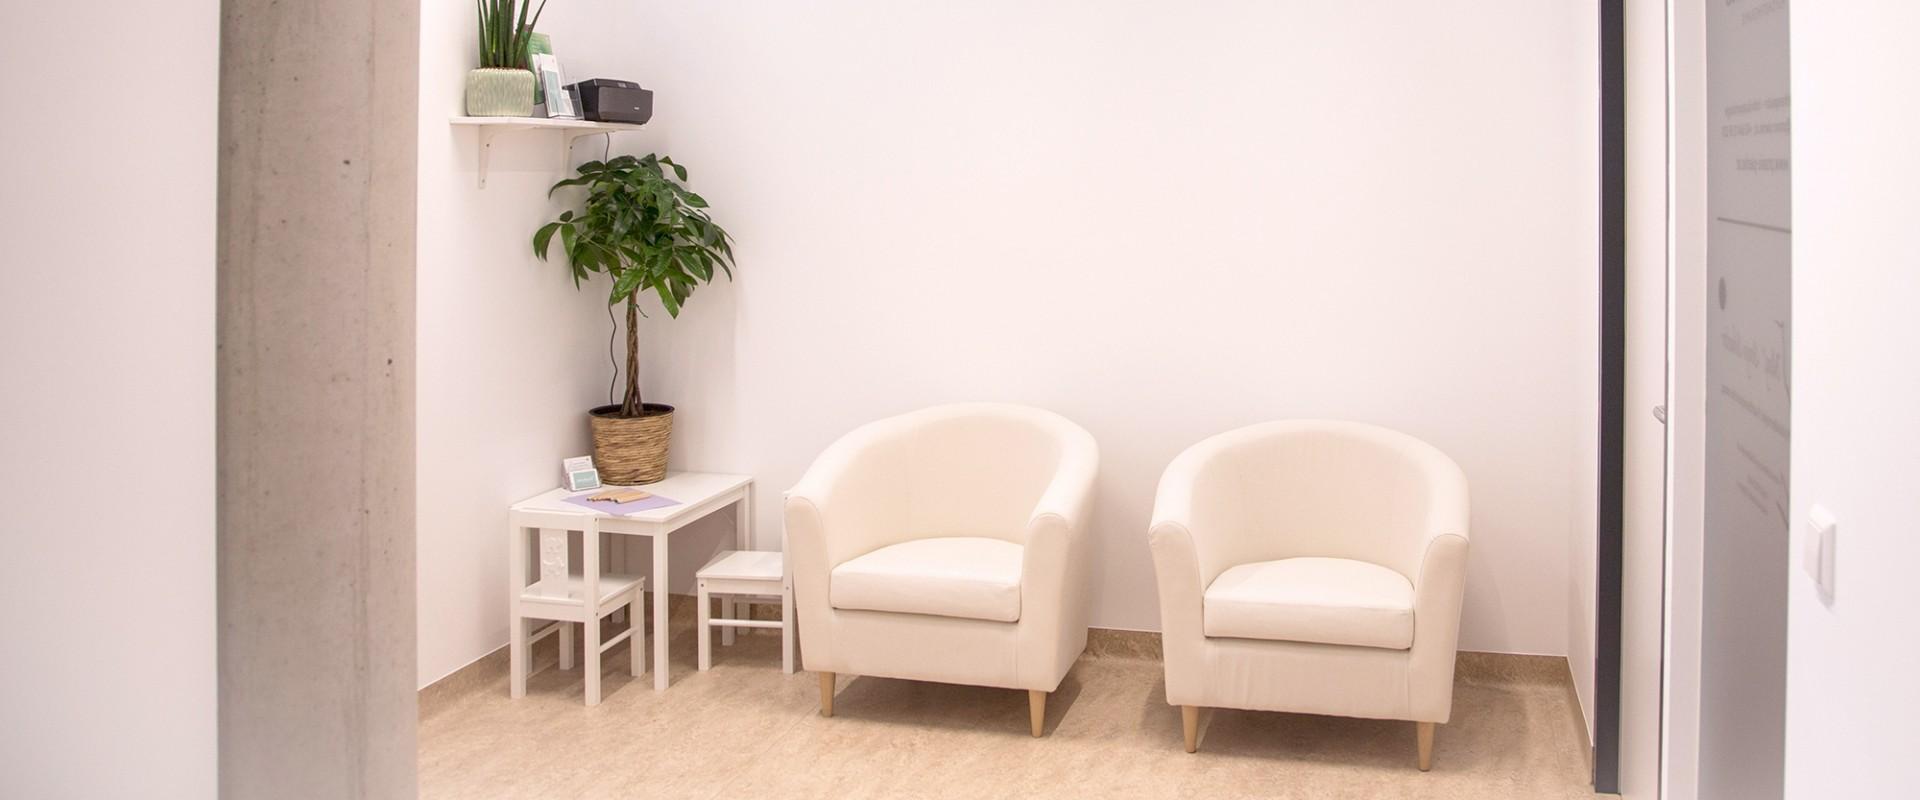 Praxis Mag. Julia Plecko Psychotherapie